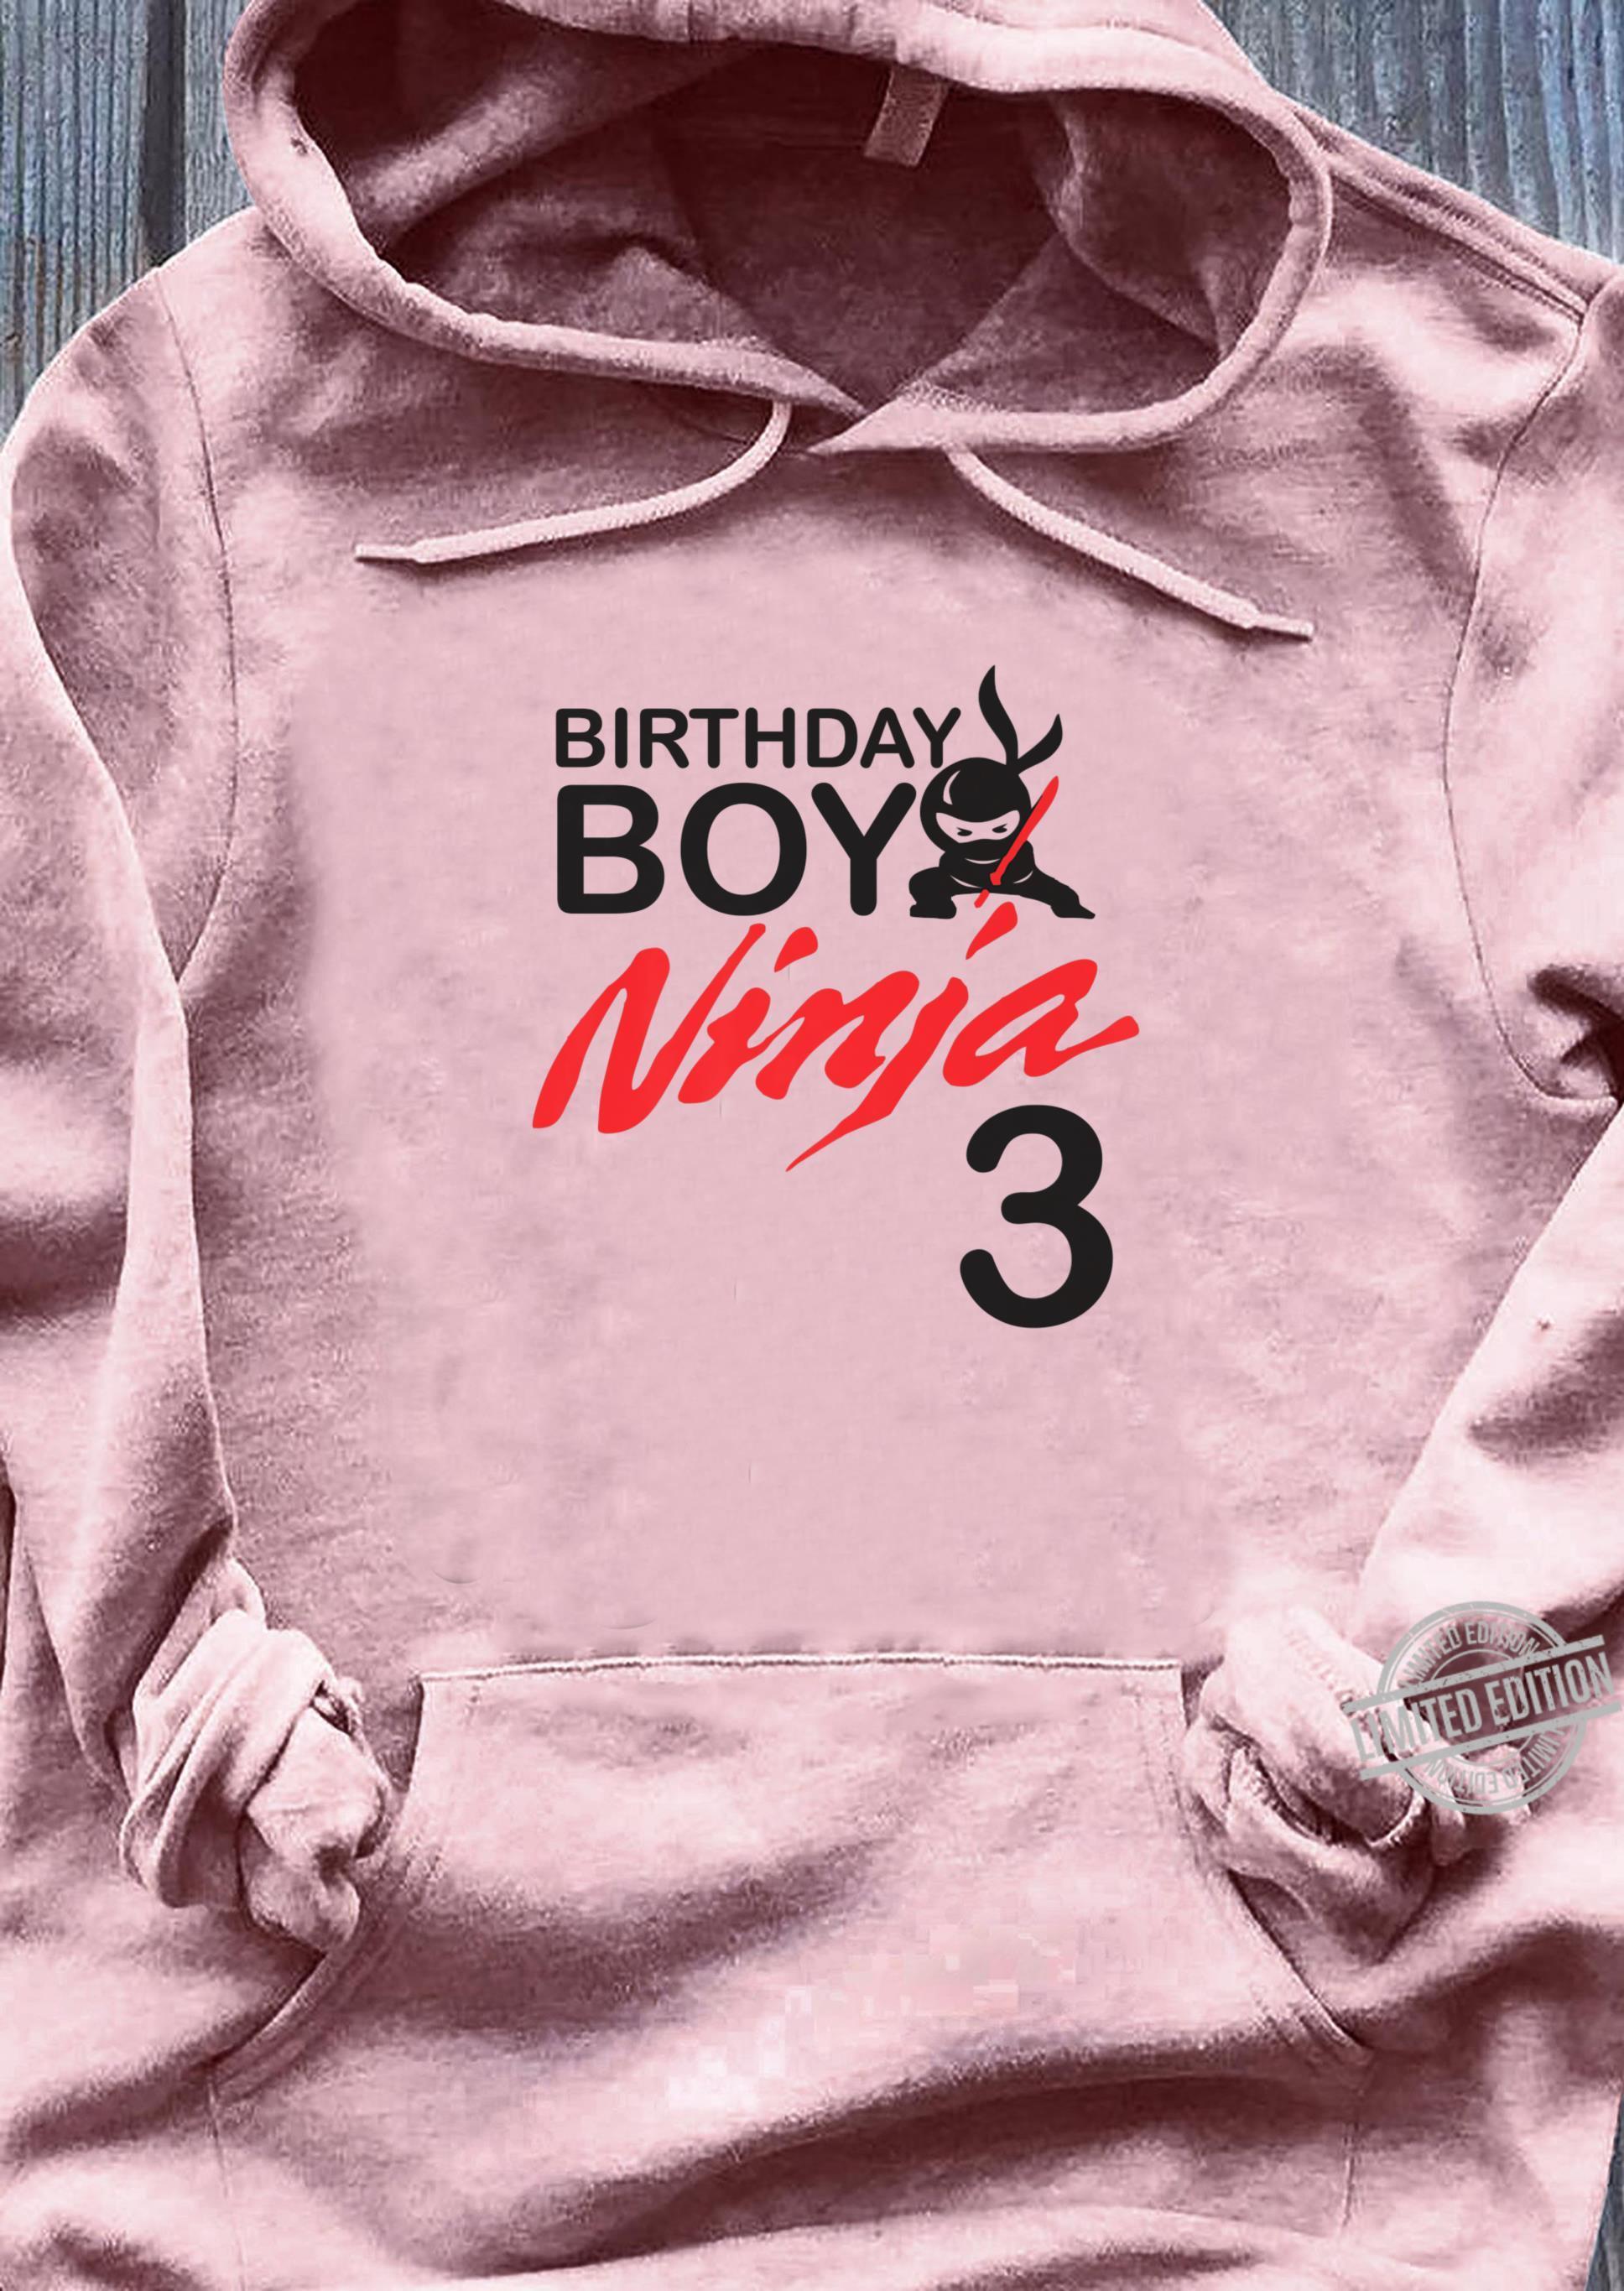 Birthday Boy Ninja 3 birthday party 3 year old ninja bday Shirt ladies tee